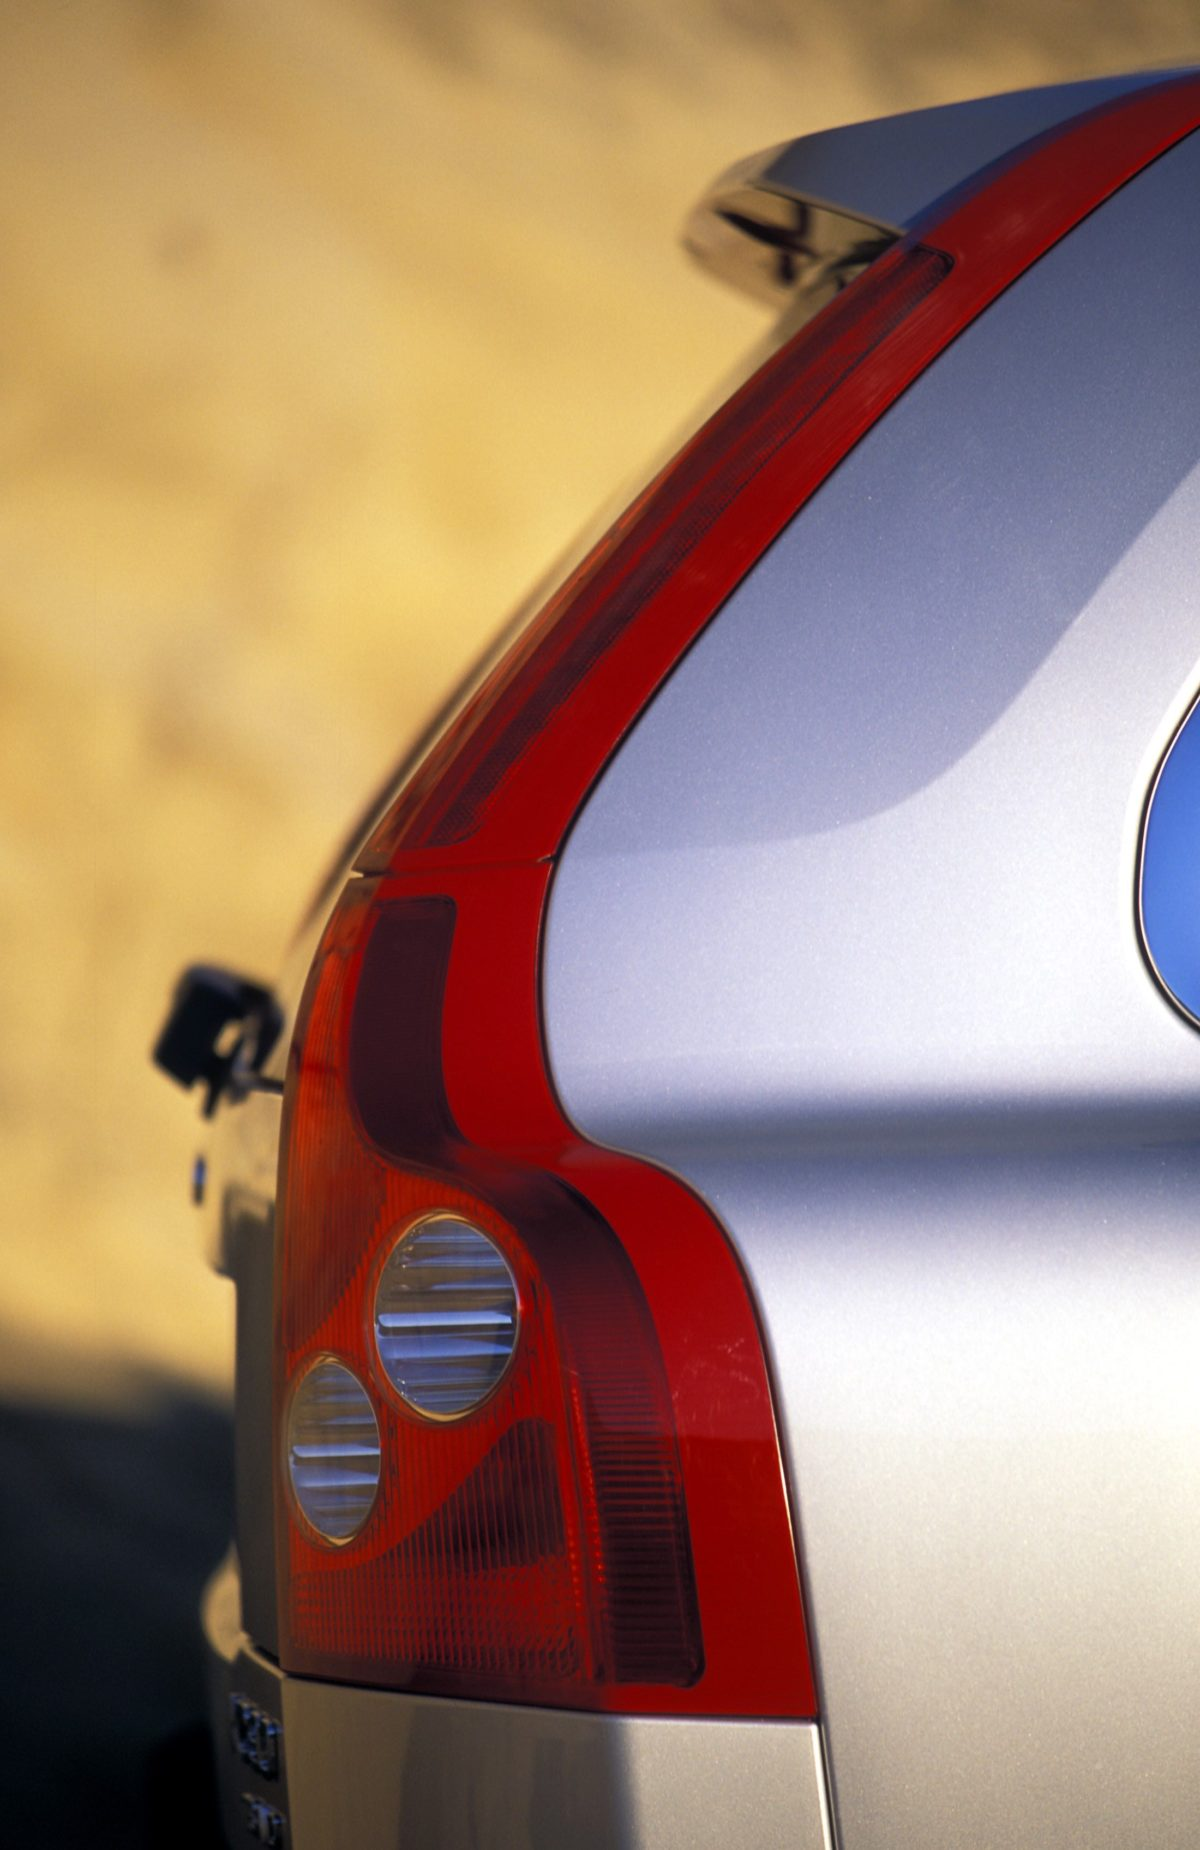 Volvo XC90 First Generation -  taillight, XC90